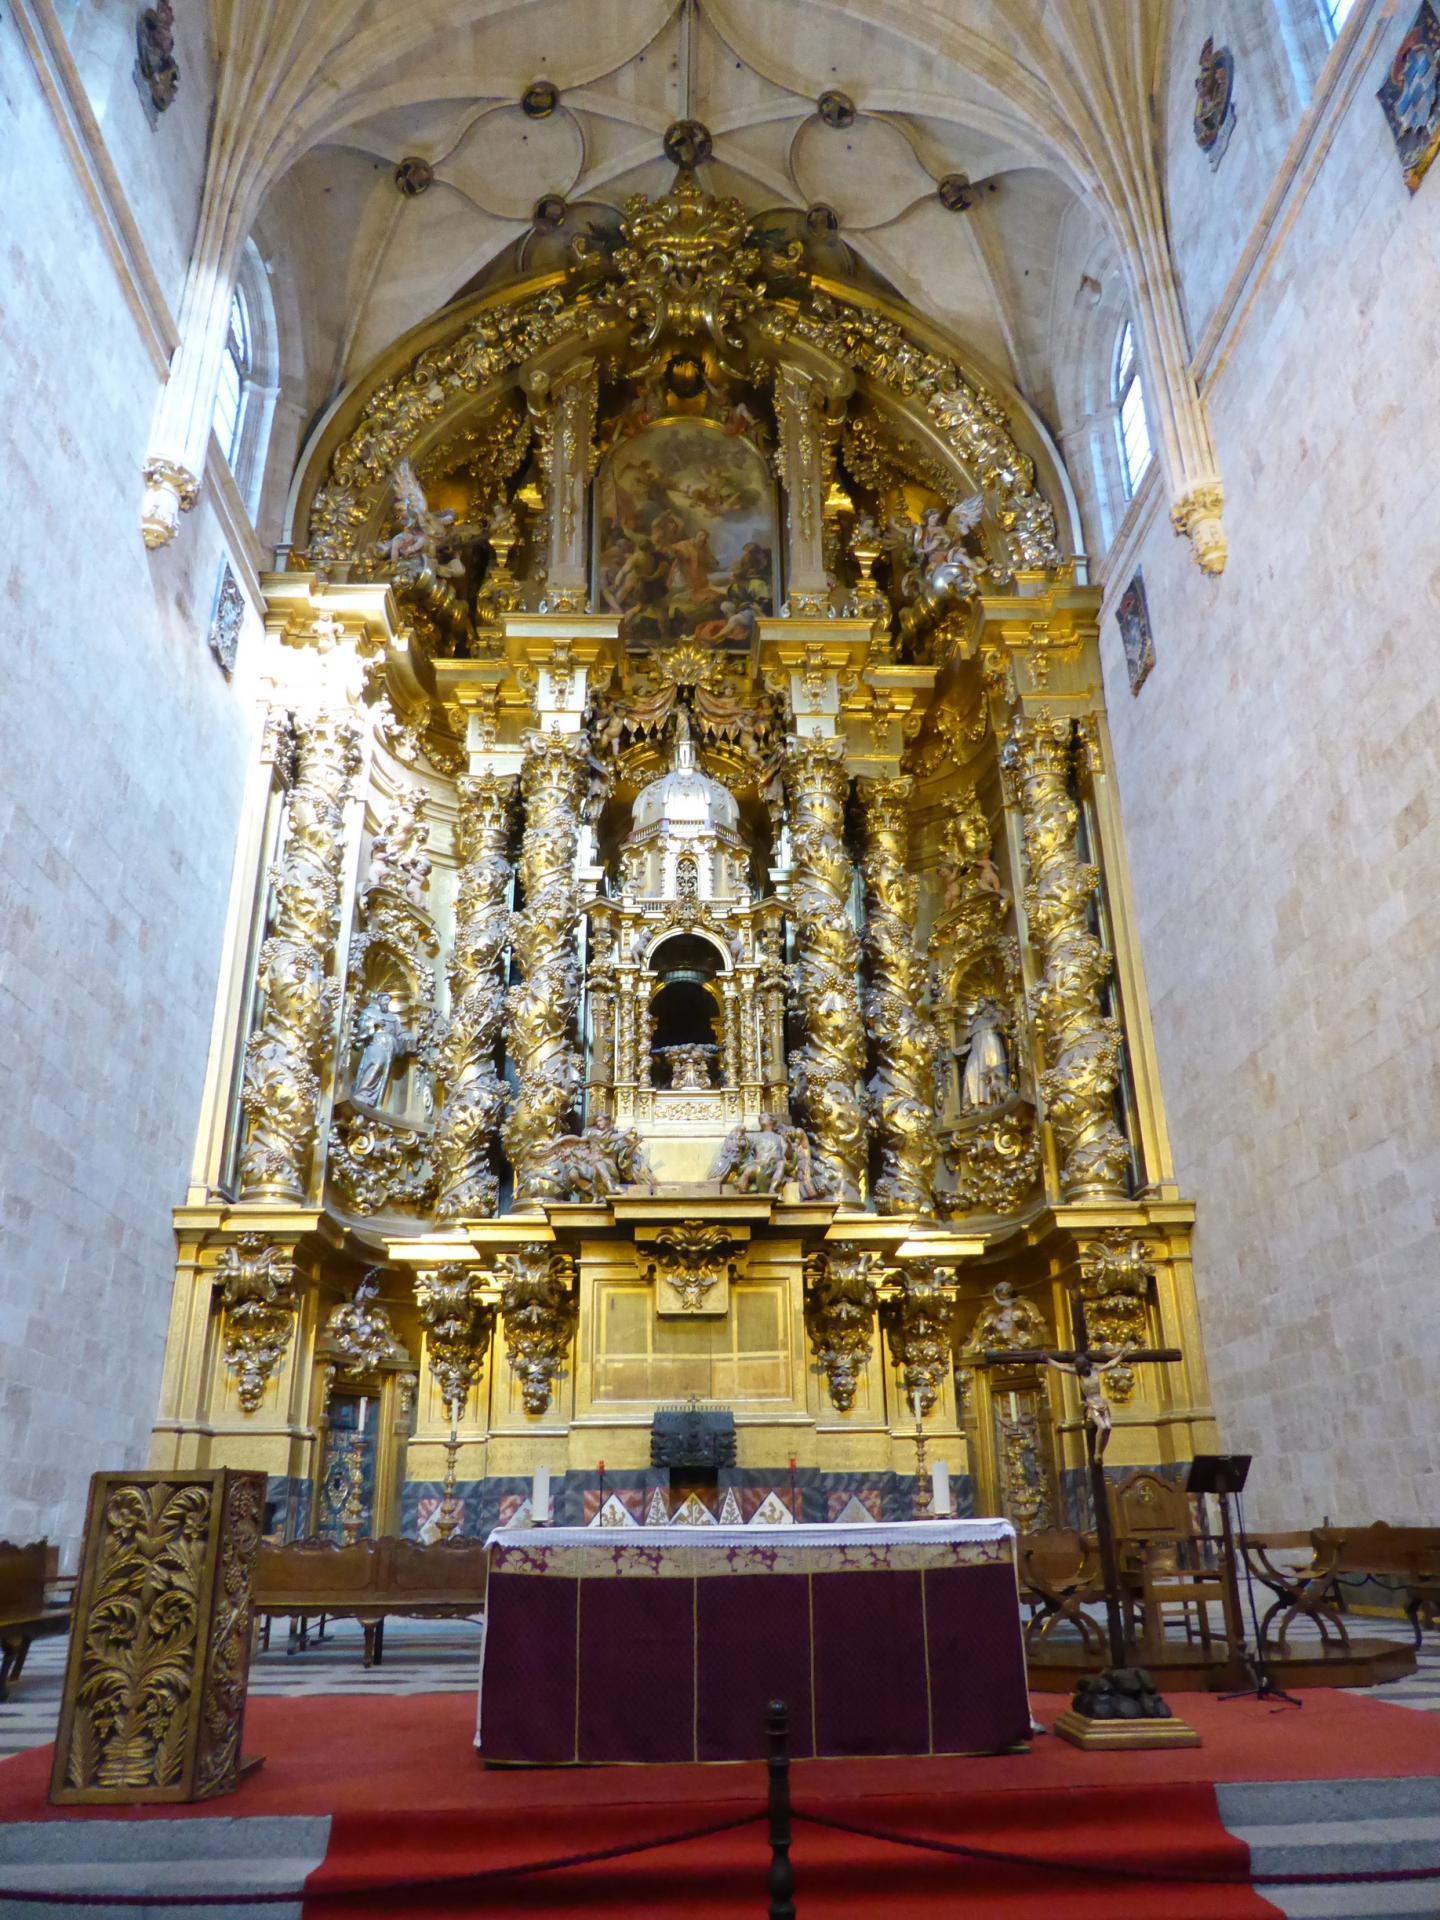 Retable du grand autel, XVIIIe siècle, cl. Ph. Cachau